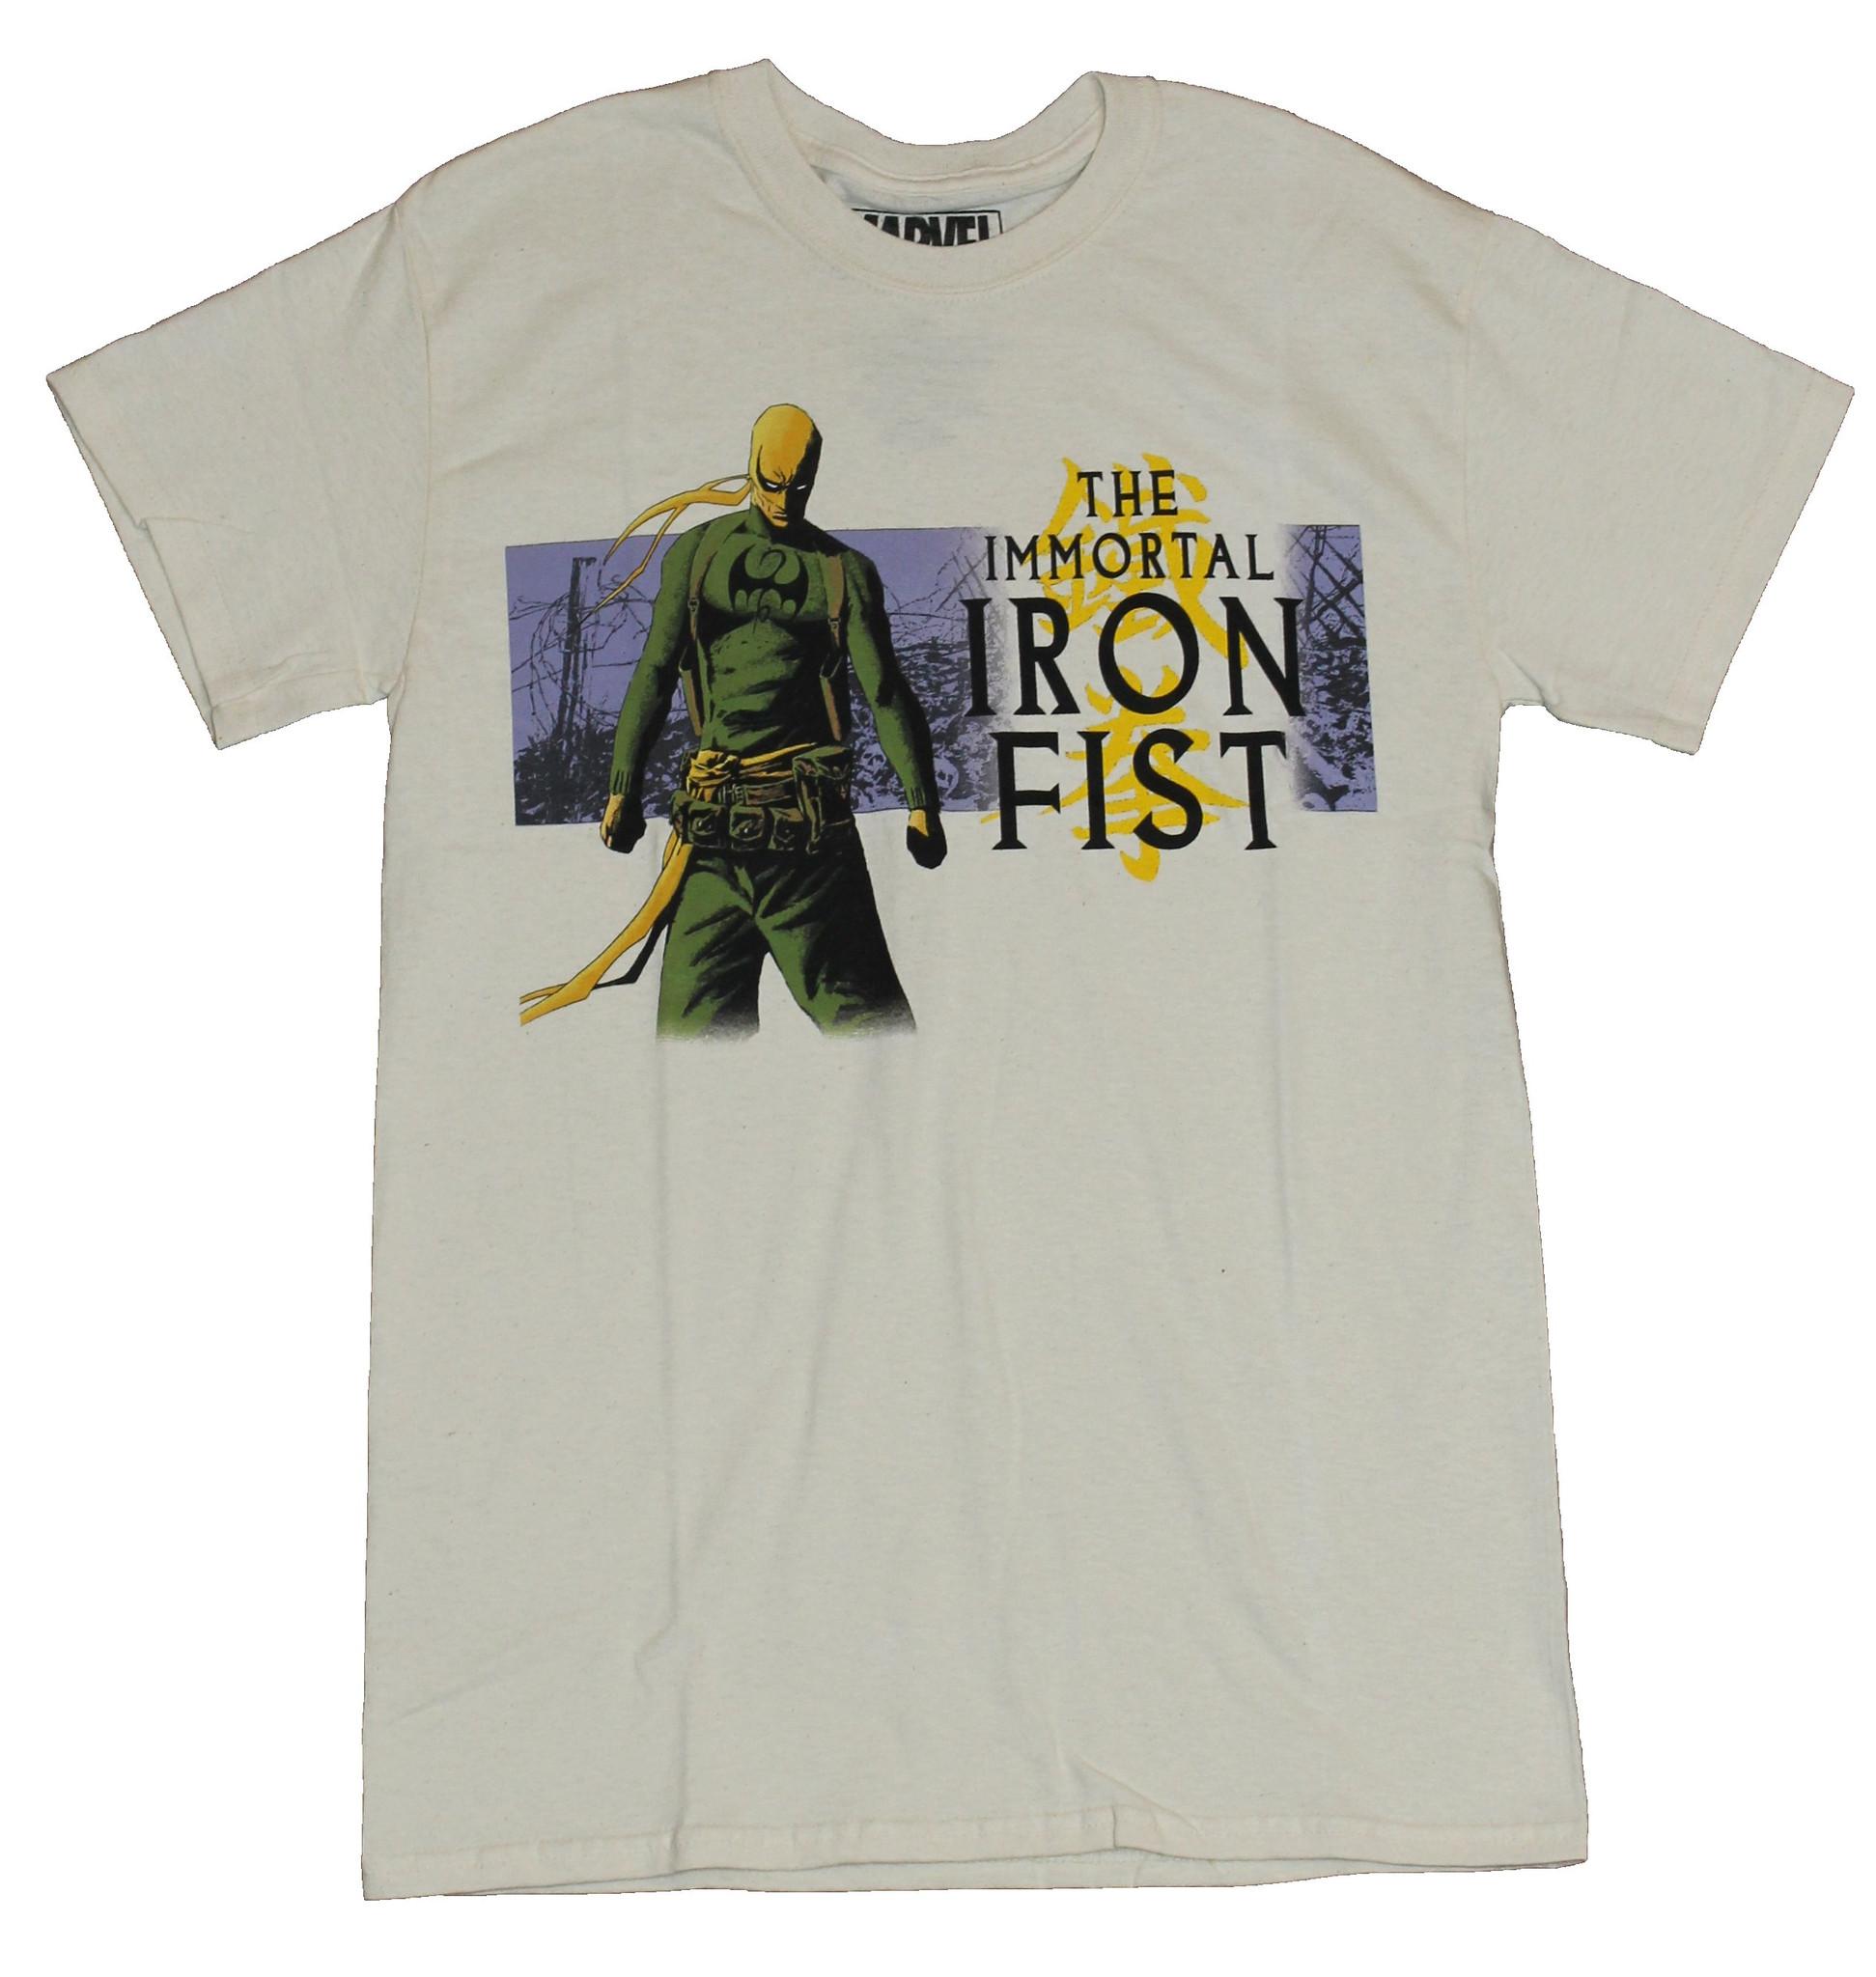 Iron Fist (Marvel Comics) Mens T-Shirt - The Immortal Iron Fist Back Turned